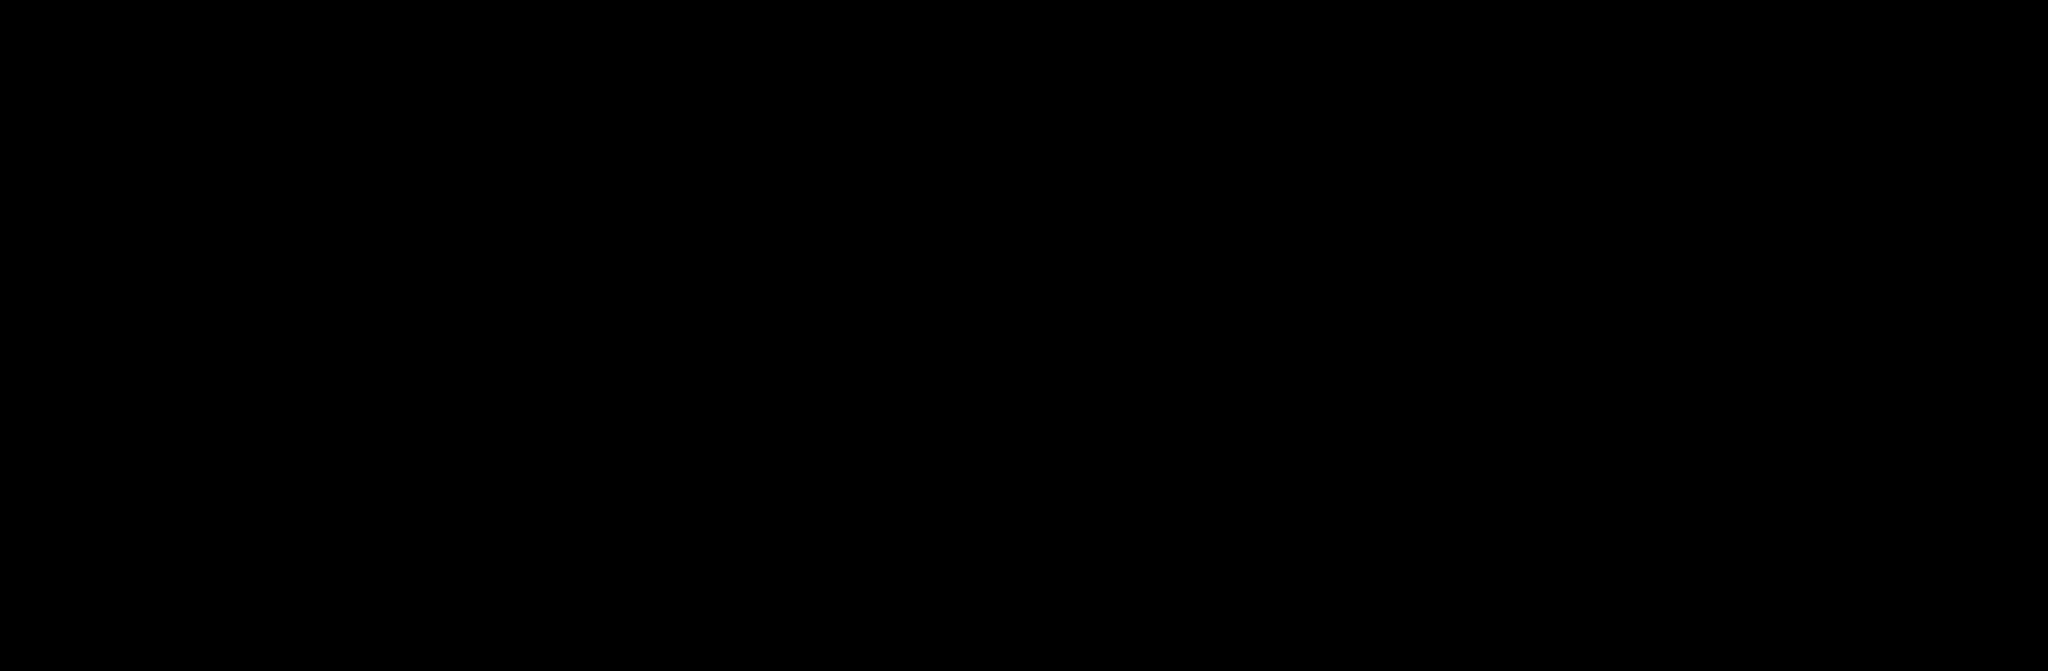 SET Dřez SCHOCK Formhaus D-100 Nero + baterie Cosmo Nero 525001